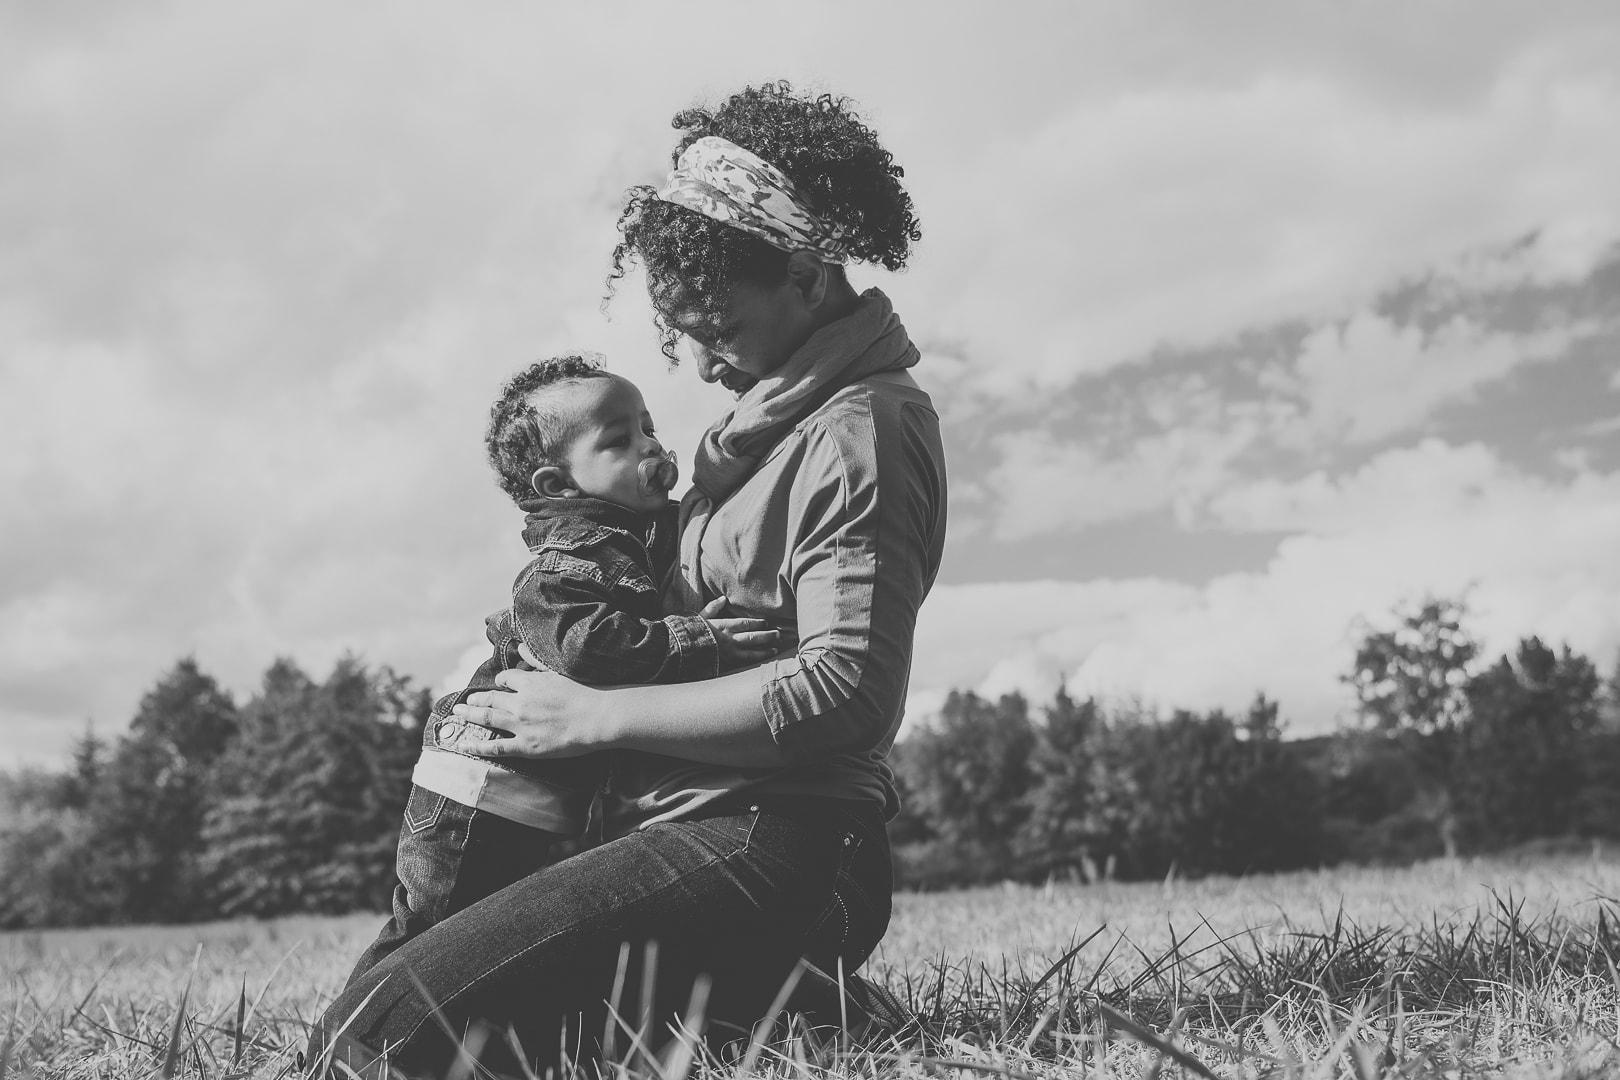 trezors-photography-photographe-professionnel-toulouse-31-enfance-seance-famille-lifestyle (6)